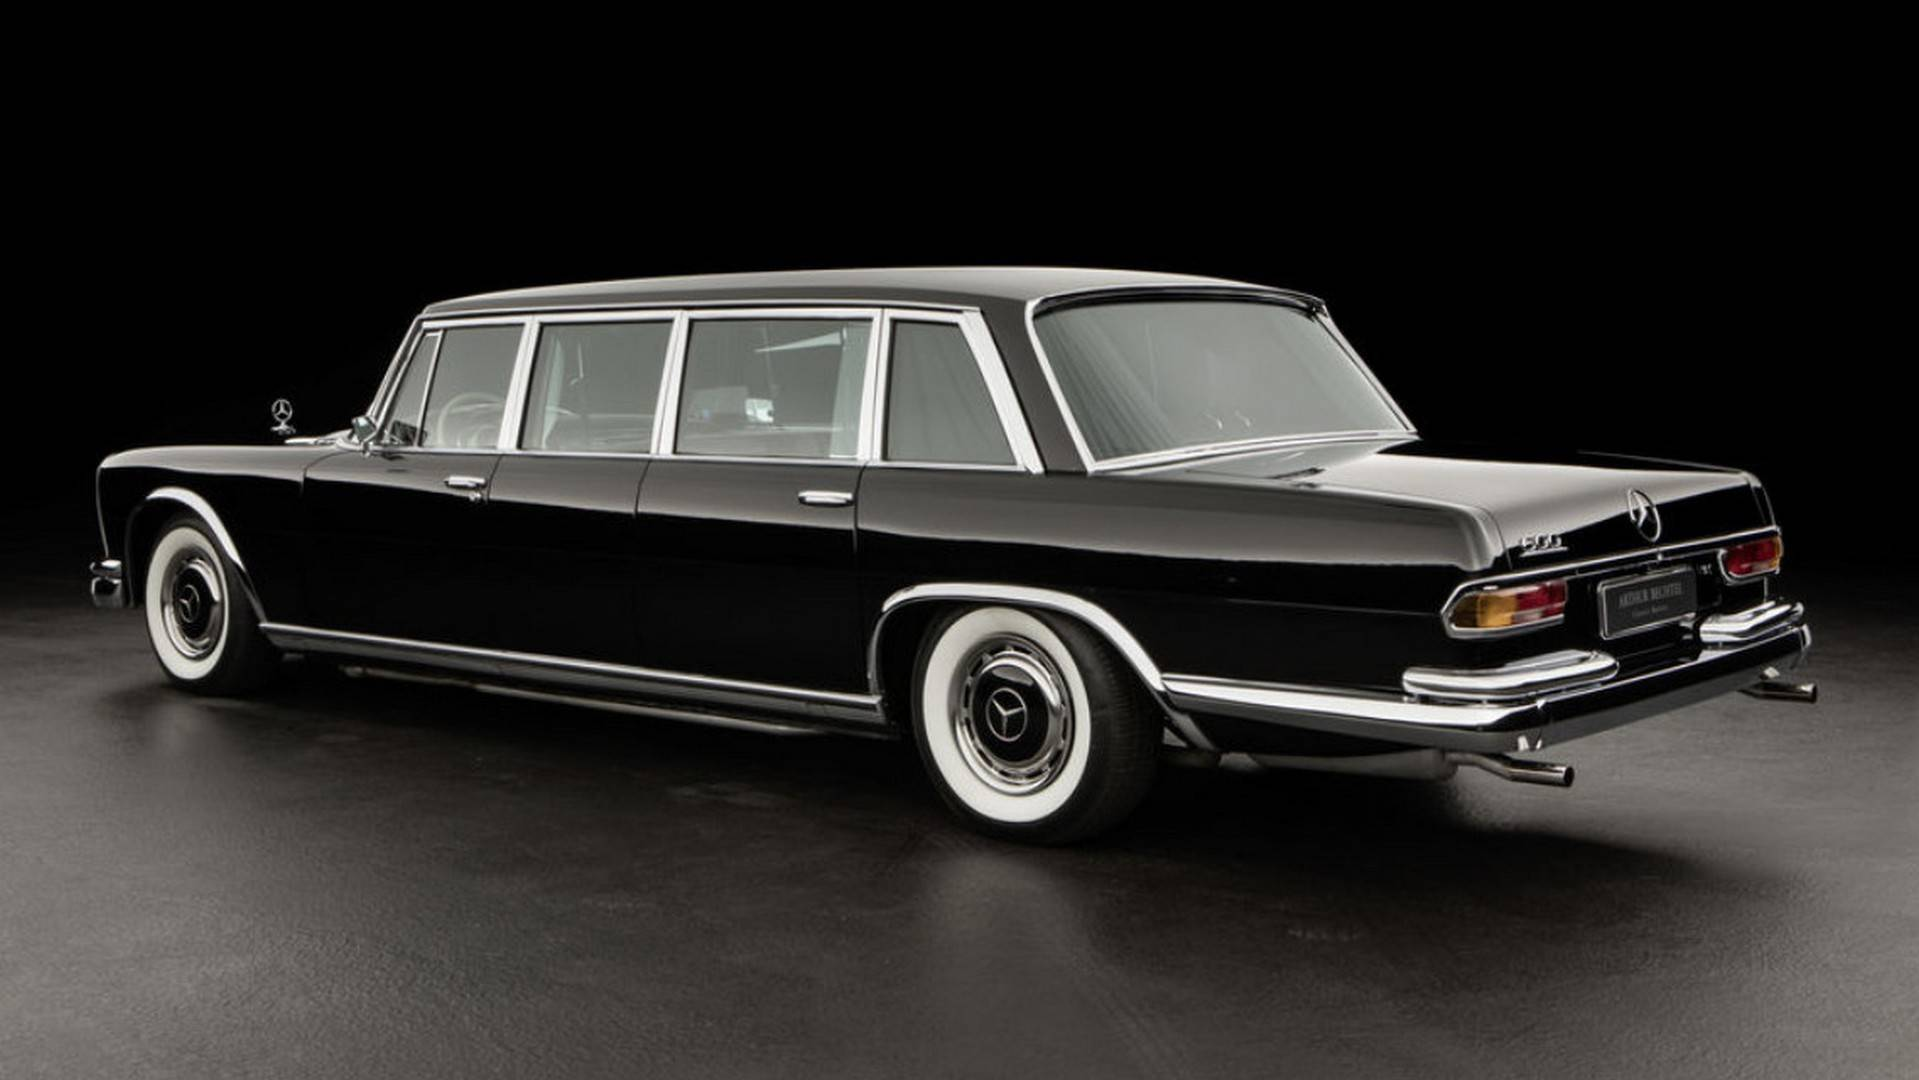 مرسدس بنز ۶۰۰ پولمن تولید سال 1964 میلادیbenz 600 pullman 1964